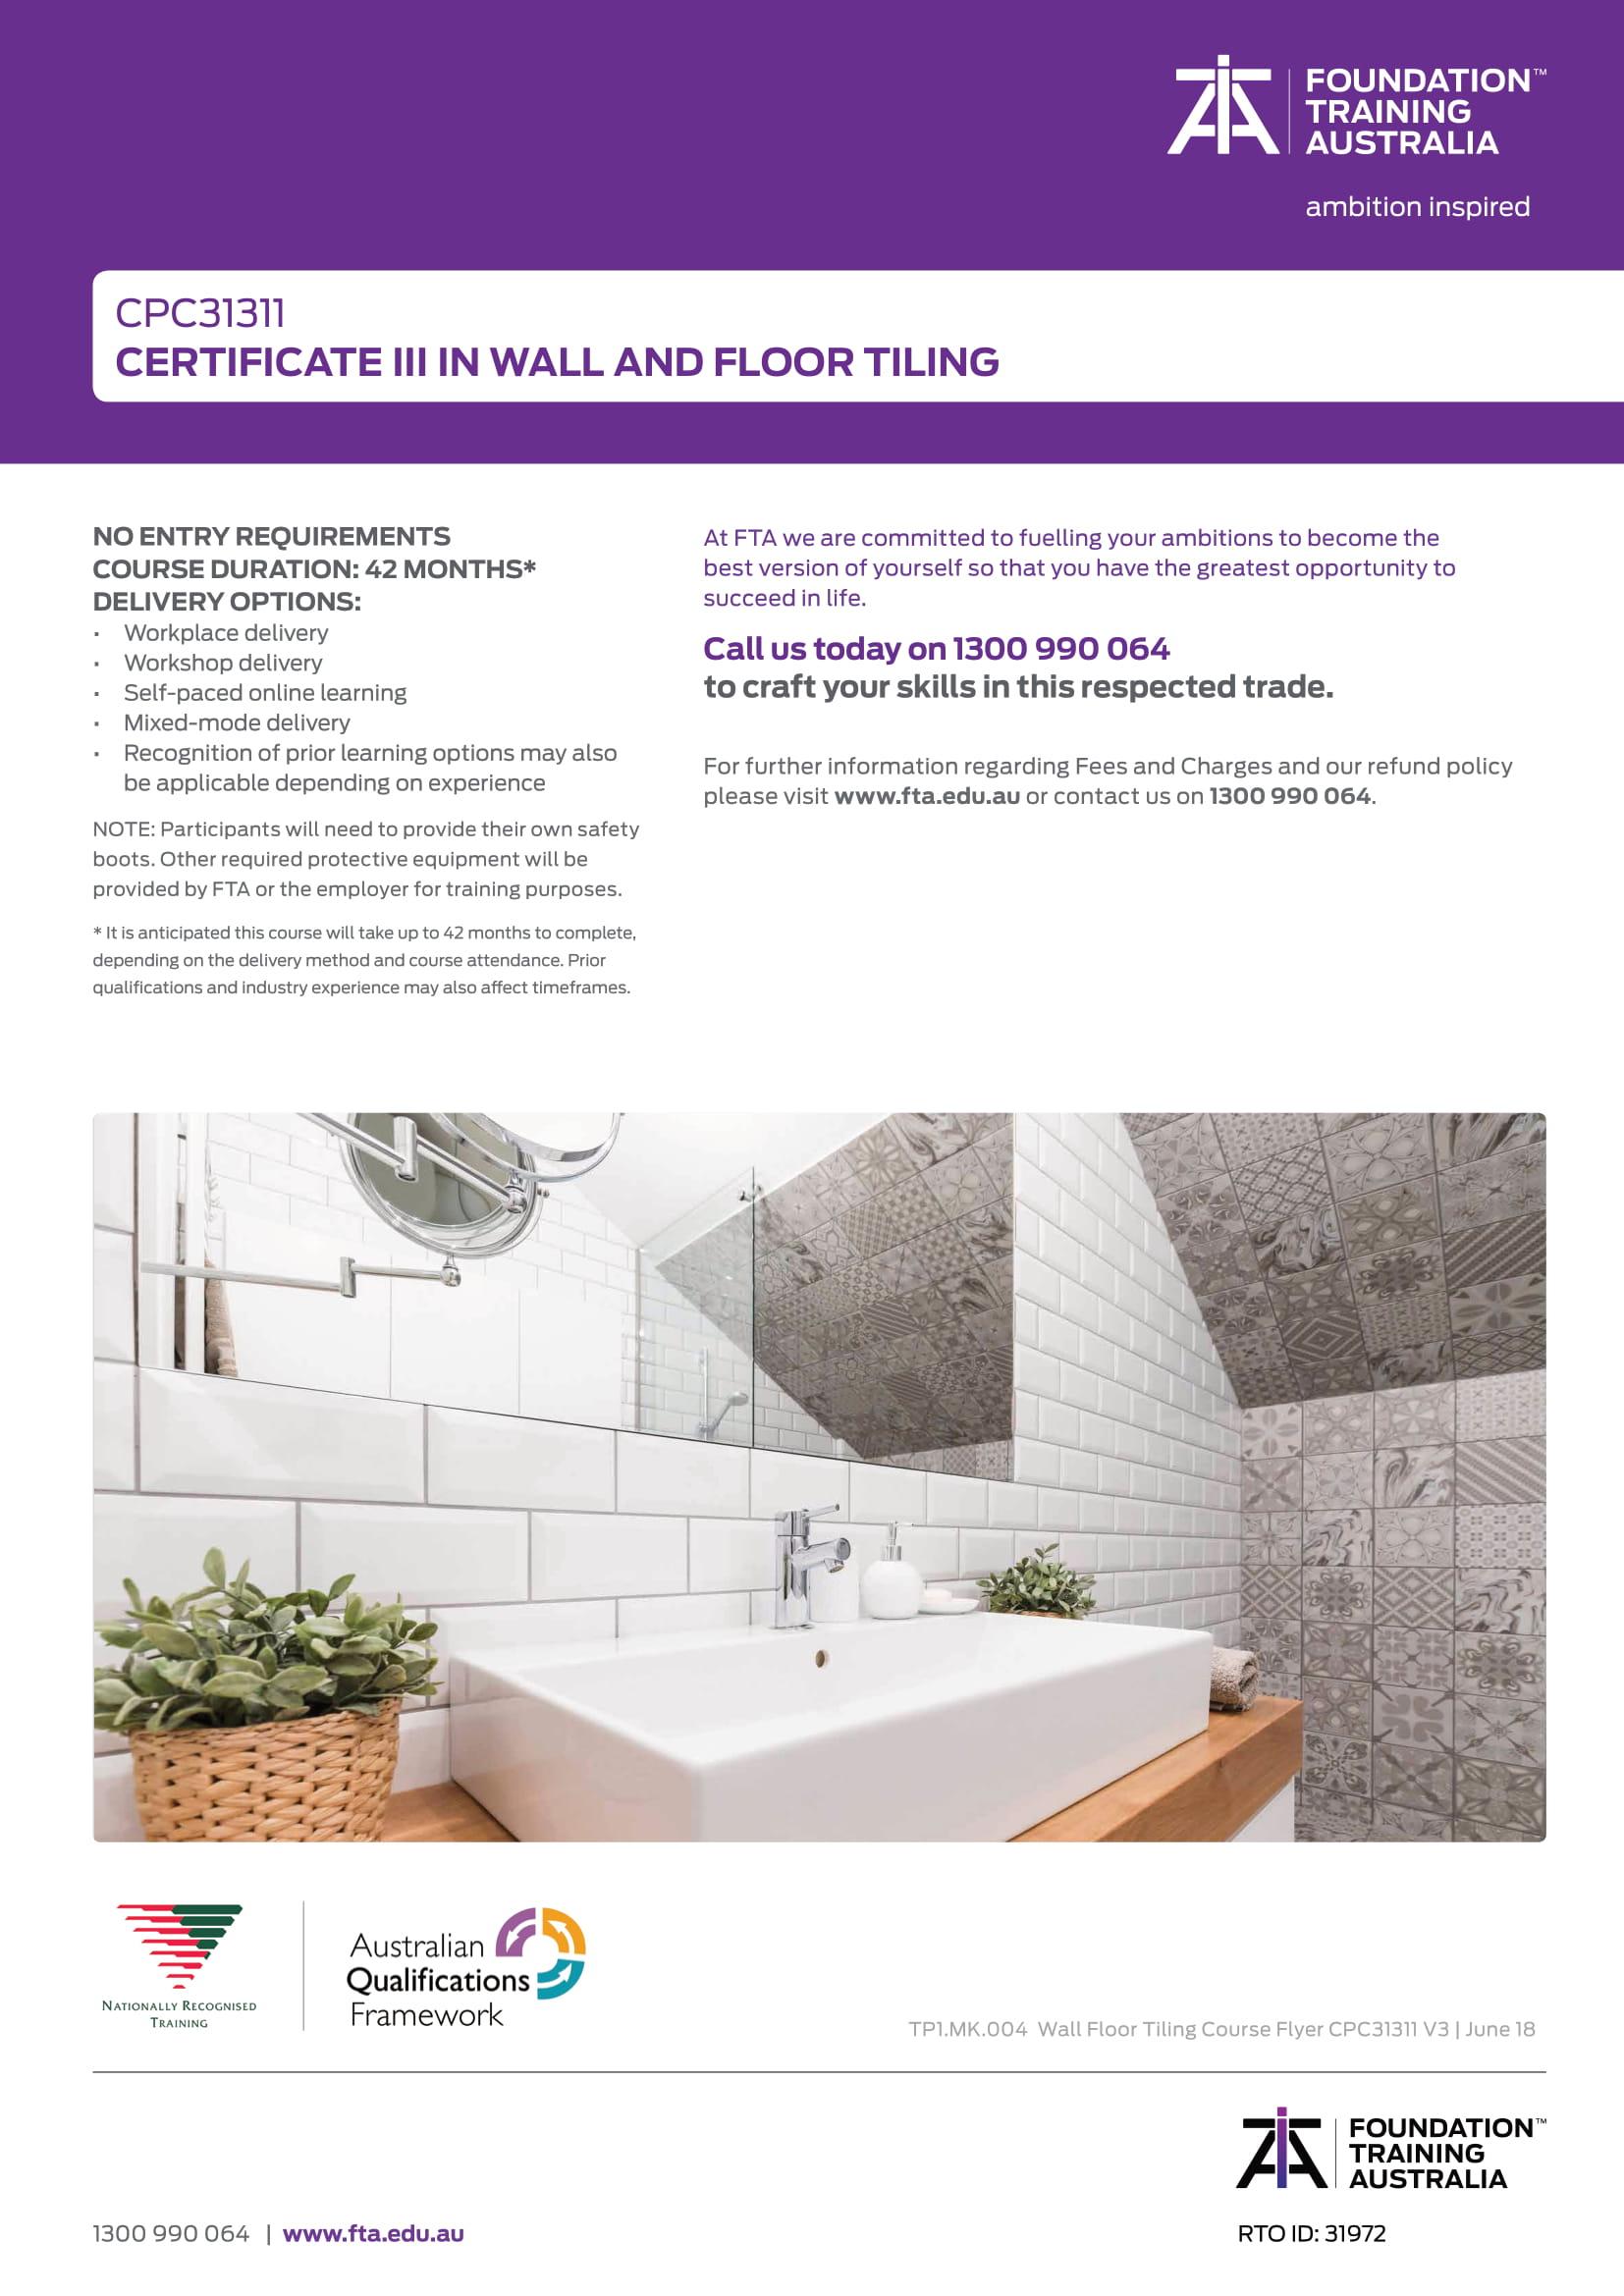 https://www.fta.edu.au/wp-content/uploads/2020/06/TP1.MK_.004-Wall-Floor-Tiling-Course-Flyer-CPC31311-V3-_-June-18-DIGITAL-1-2.jpg